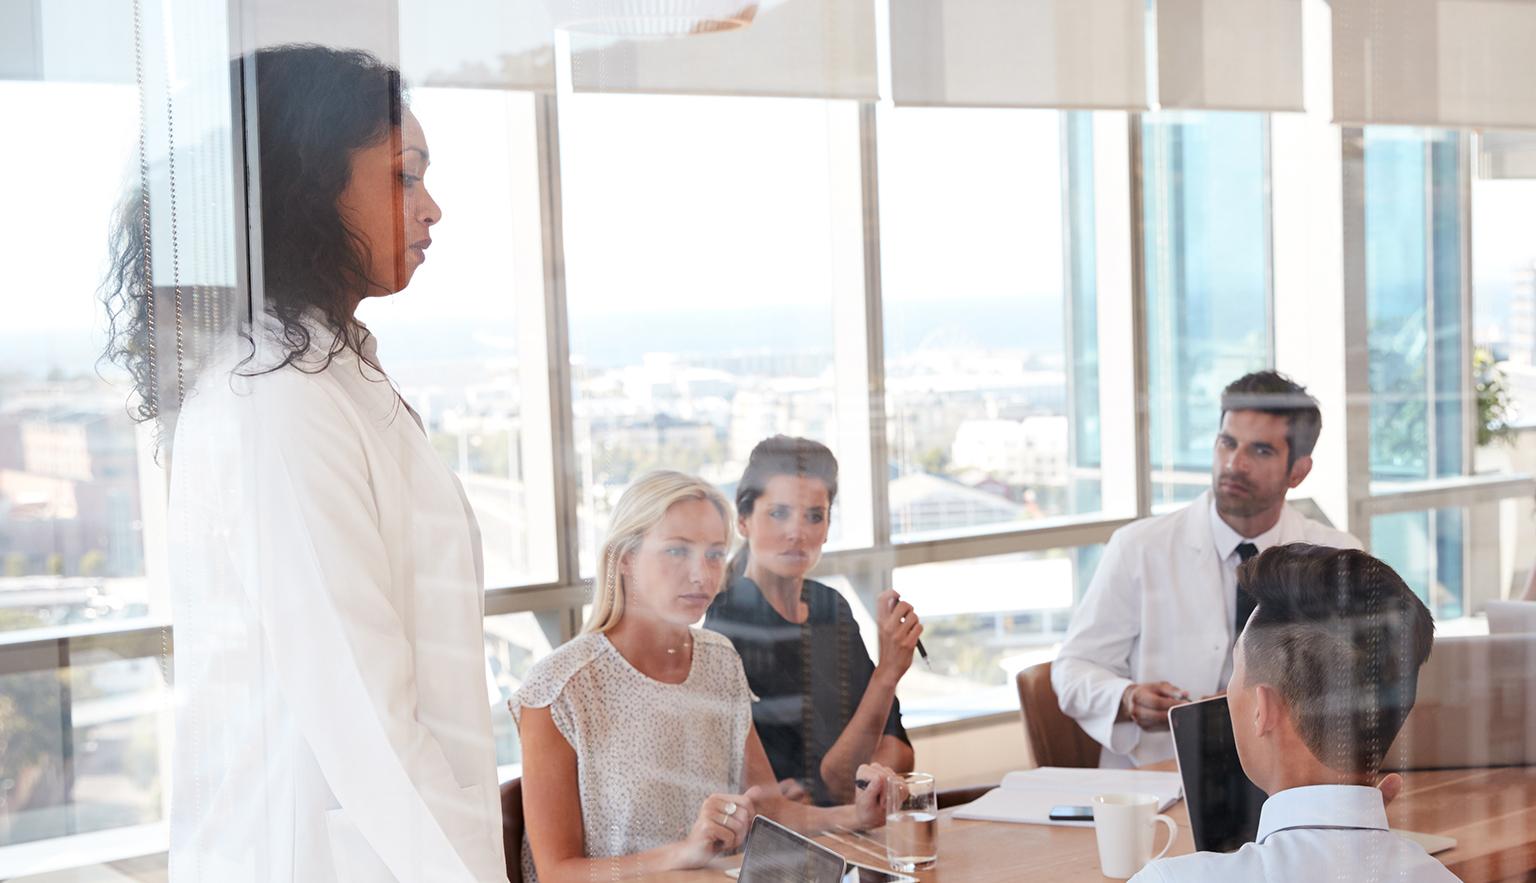 Healthcare workers meeting in a hospital meeting room